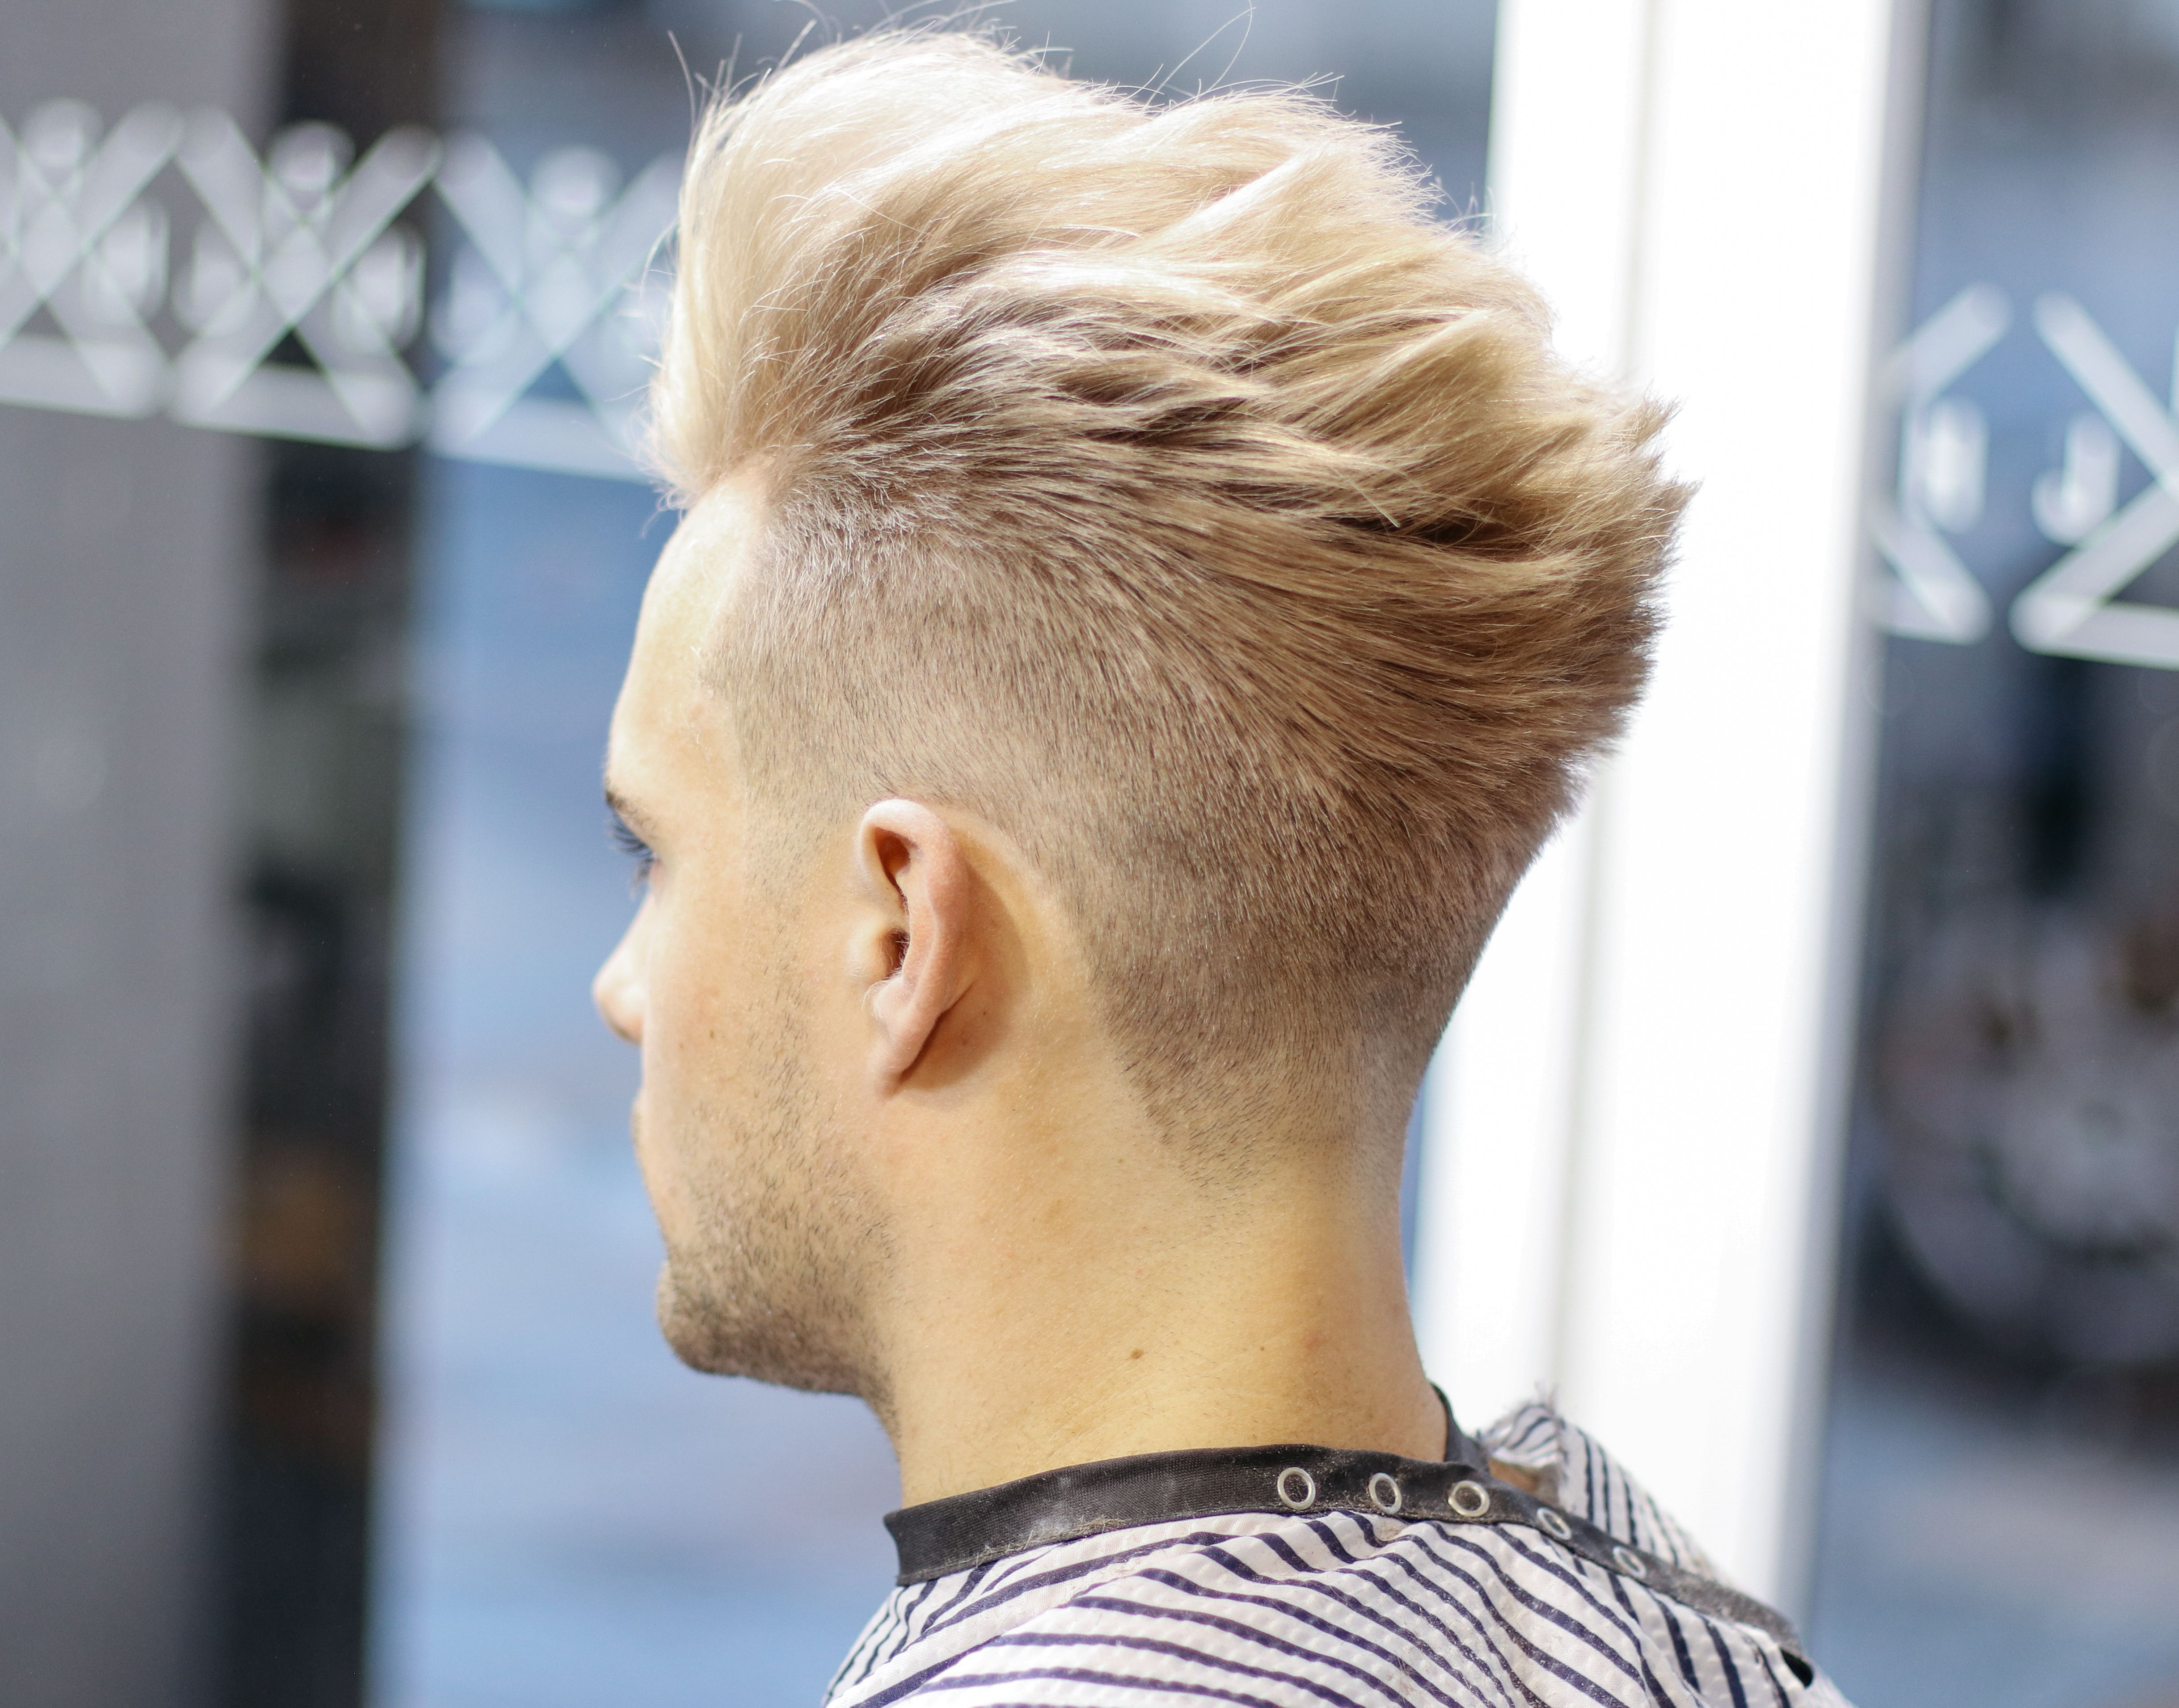 Men's Hair 2018 Platinum Blonde Pompadour X Clean Fade (View 6 of 20)